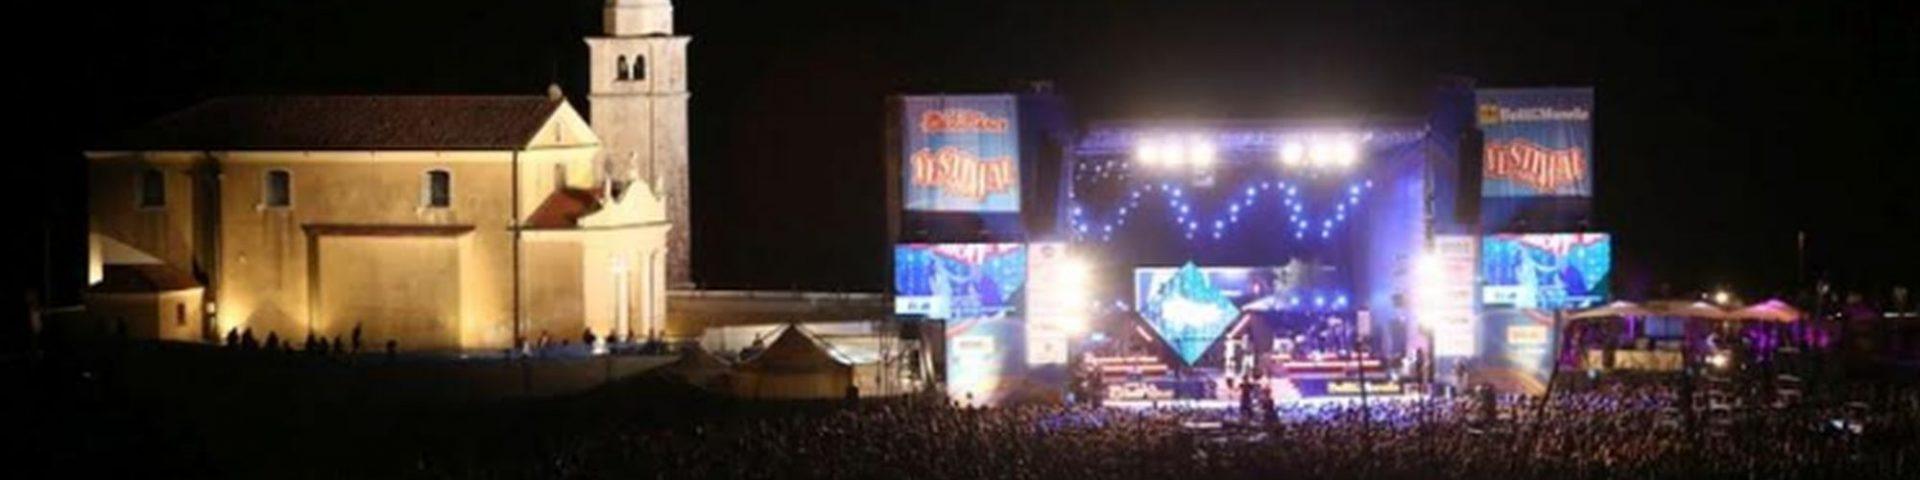 Festival Show 2019 a Caorle